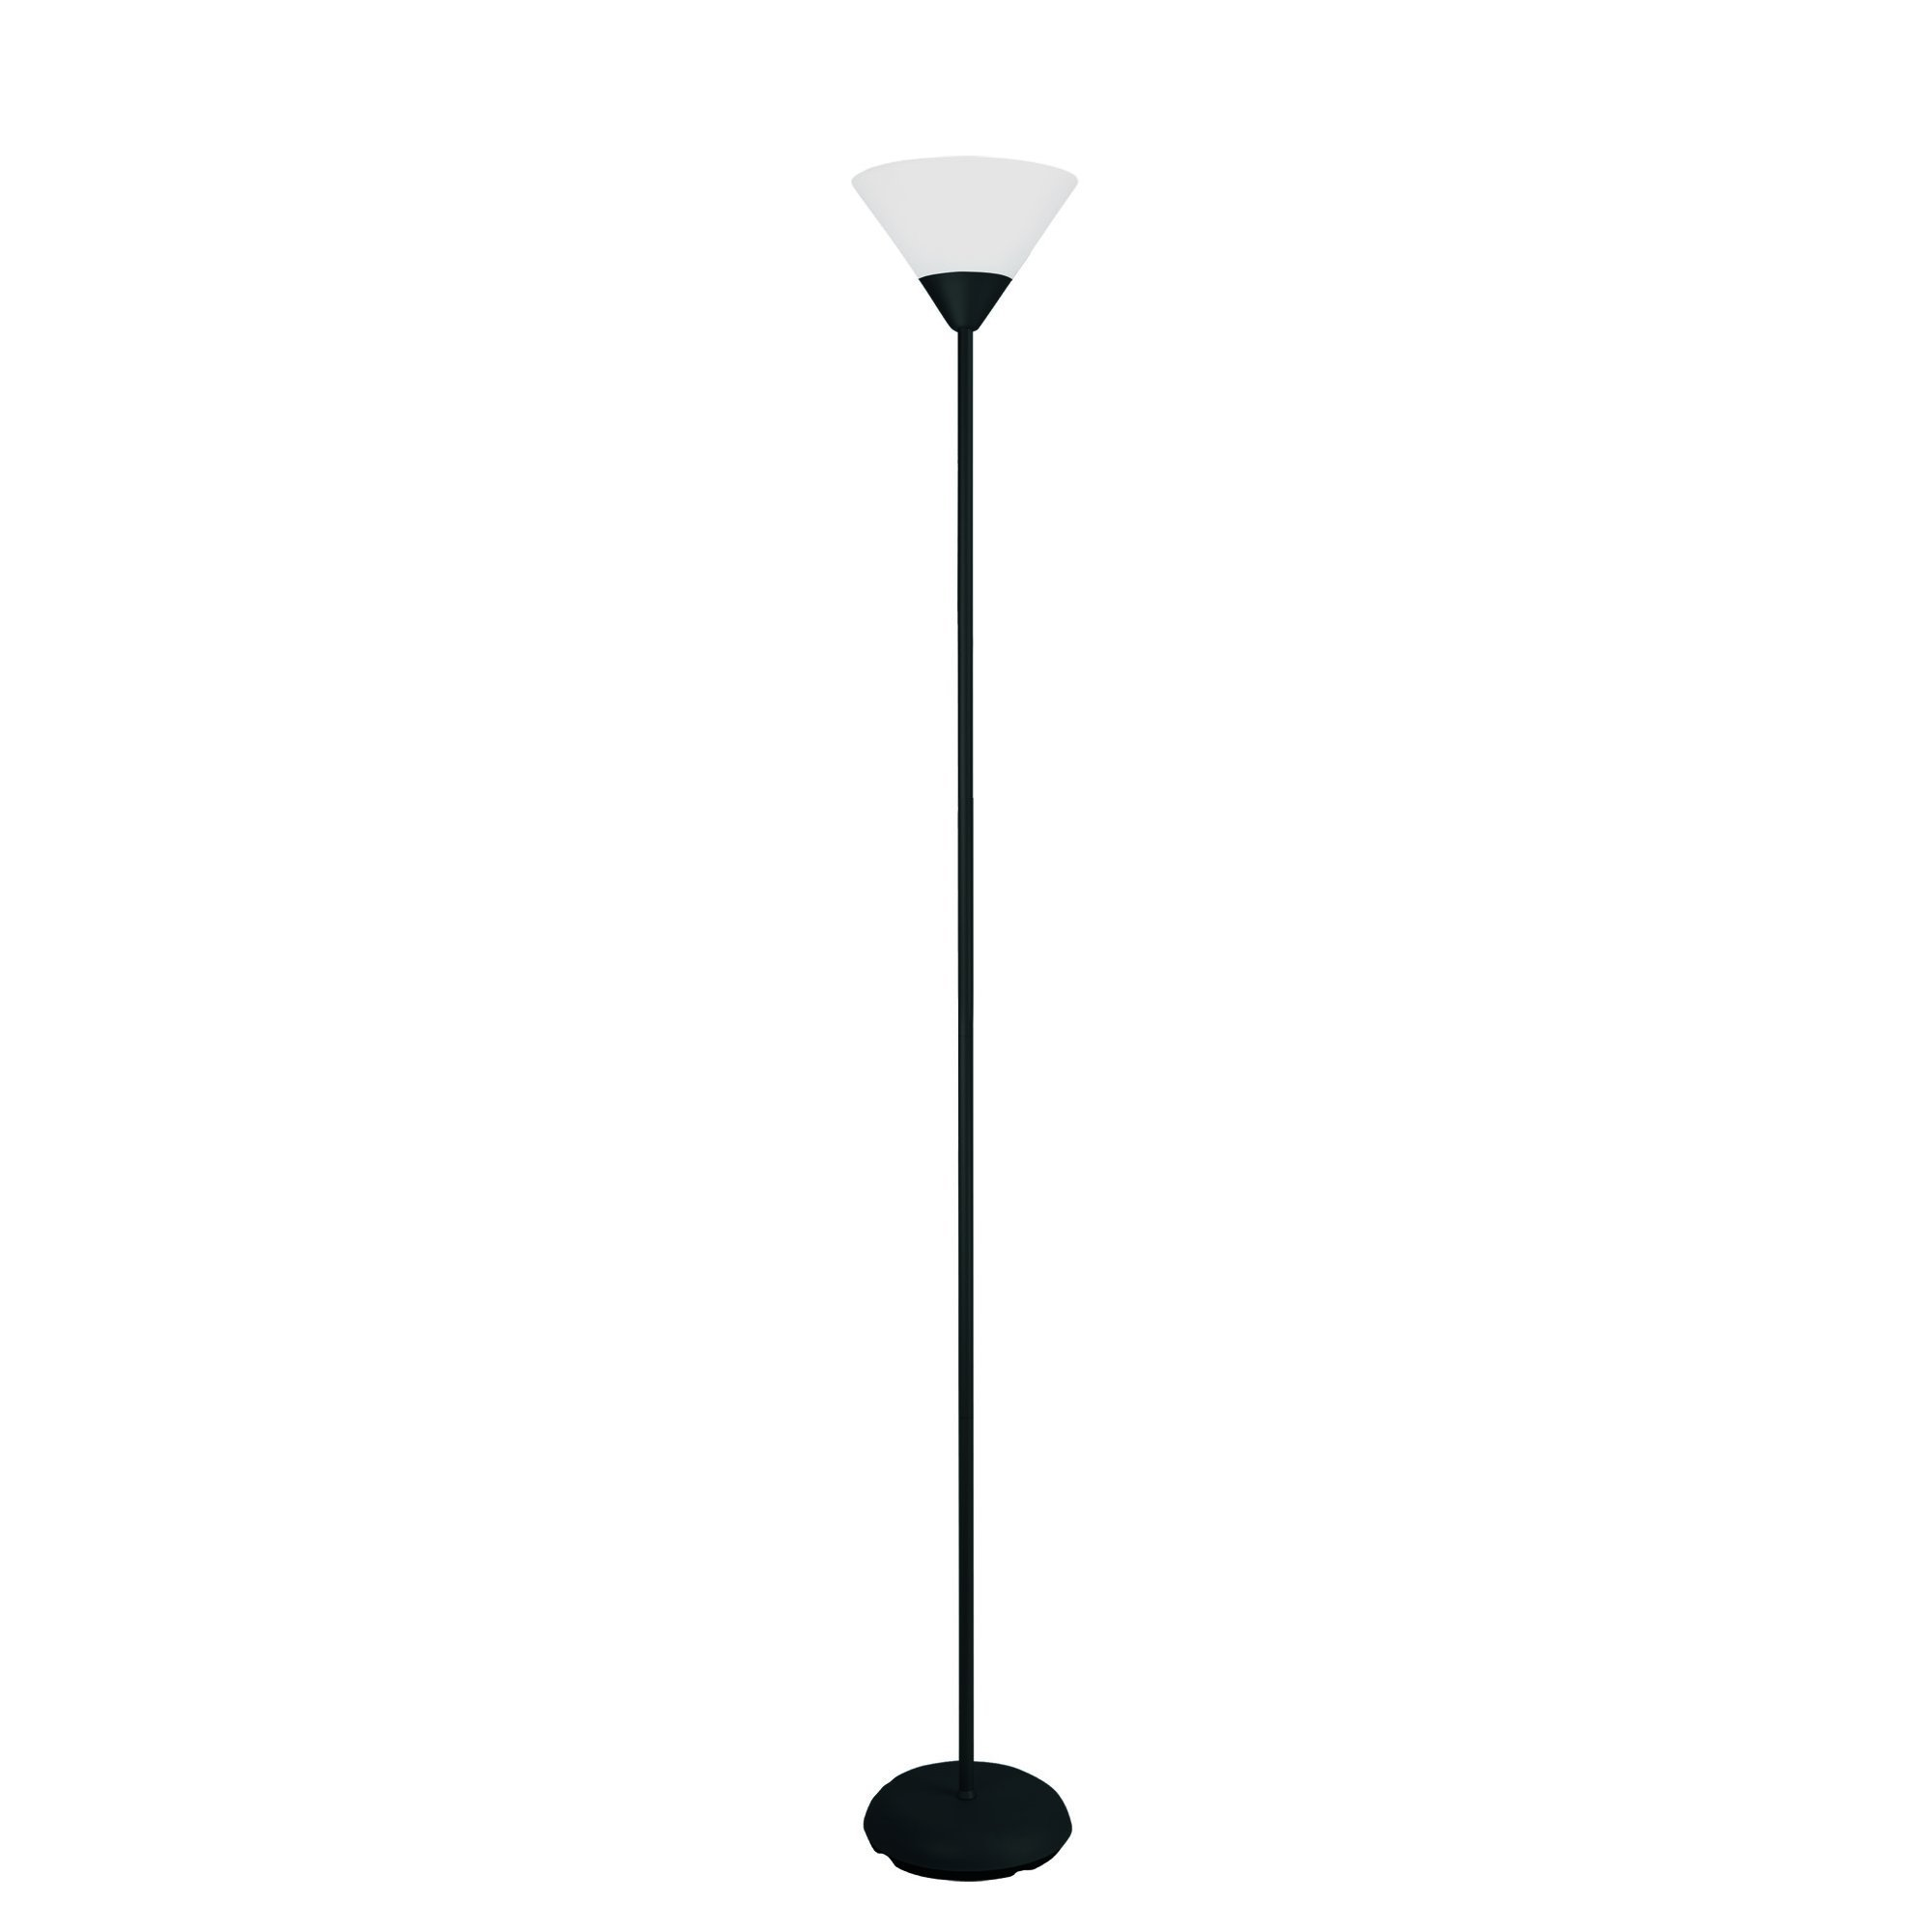 Simple Designs LF1011-BLK 1 Light Stick Torchiere Floor Lamp, Black